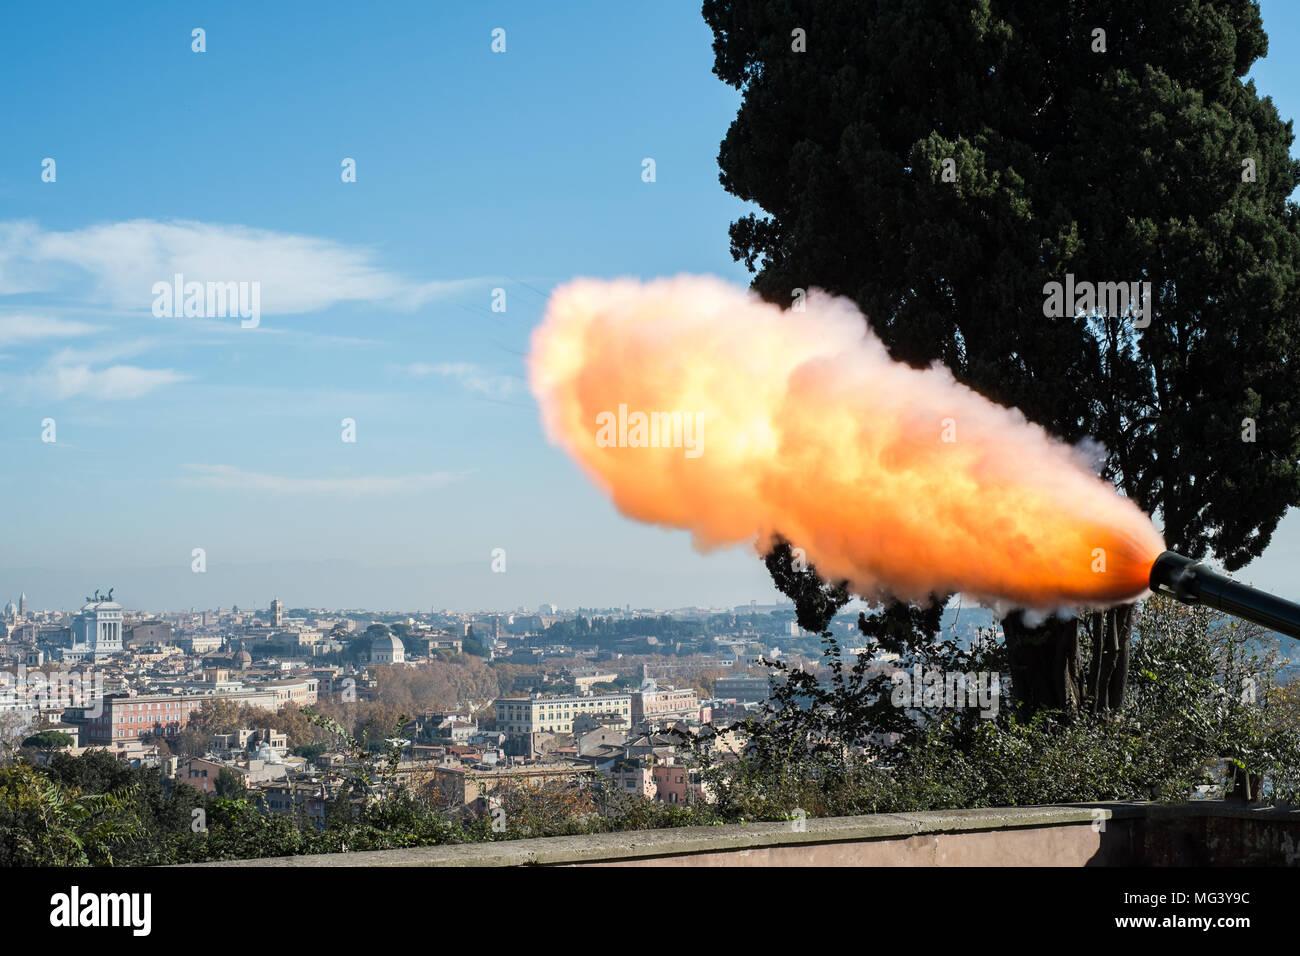 The twelve o'clock ritual gun fire in Rome from Gianicolo hill. - Stock Image